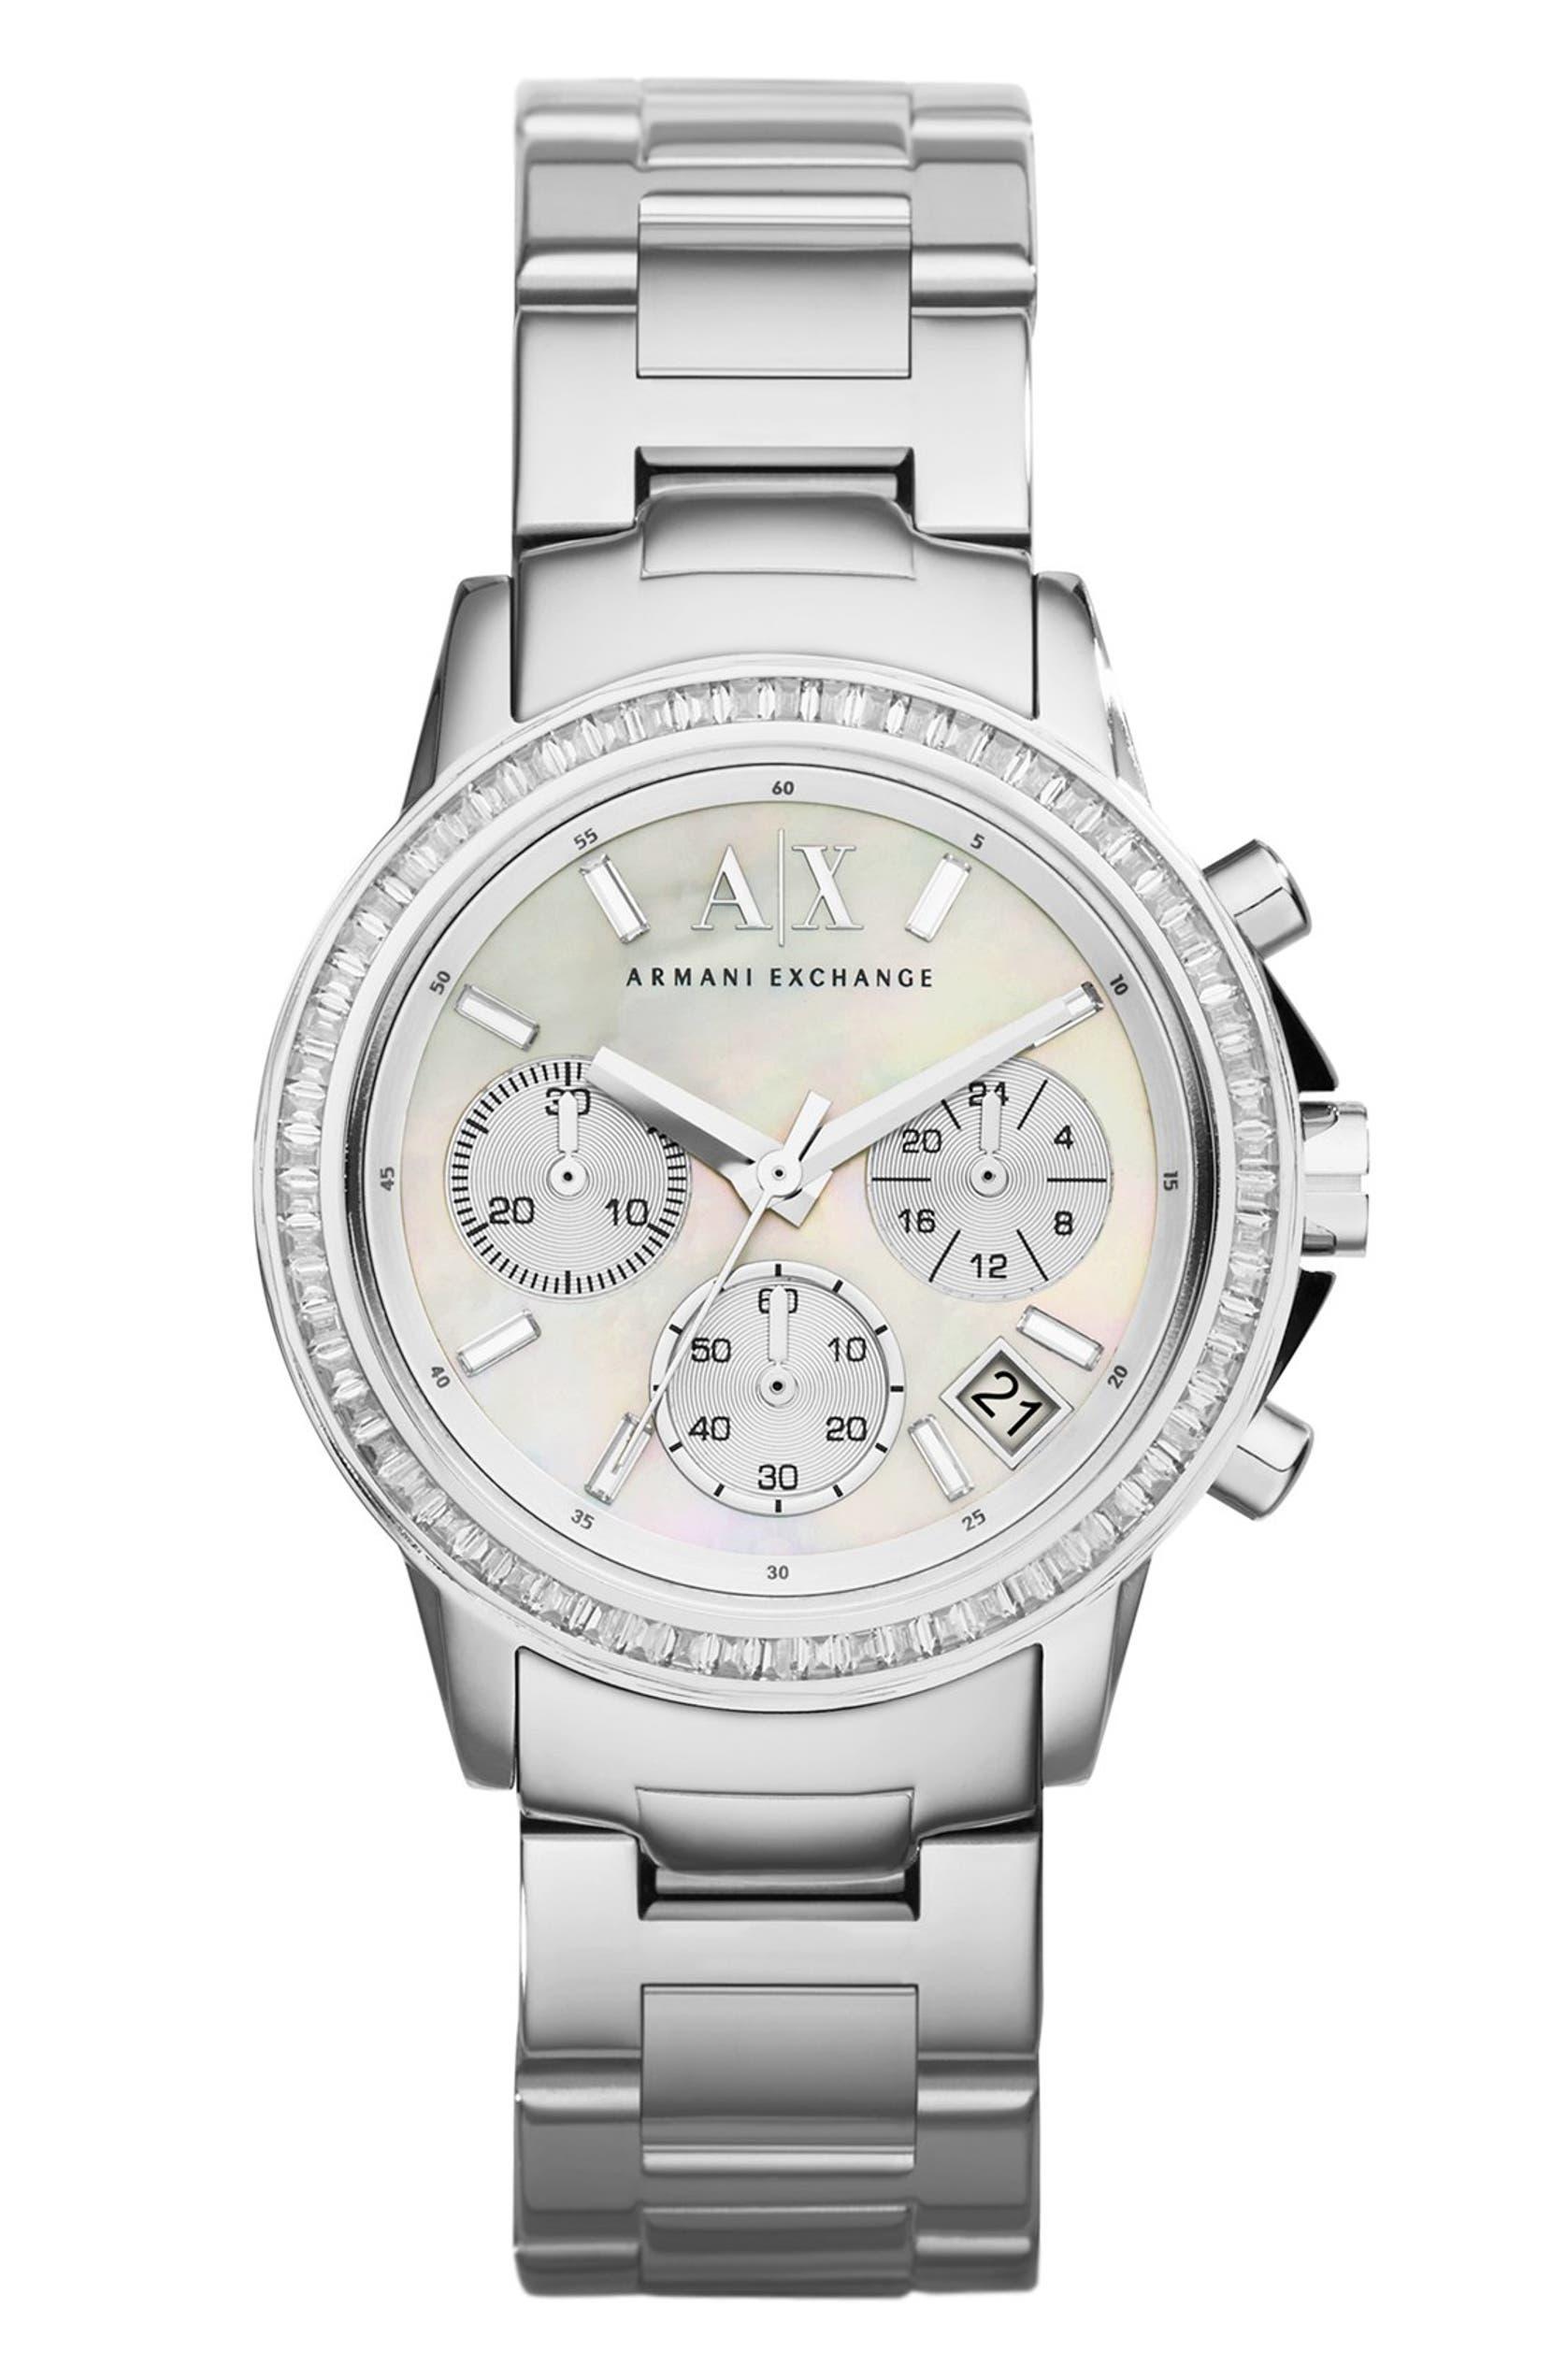 ac95b1eb6a39 AX Armani Exchange Crystal Bezel Chronograph Bracelet Watch